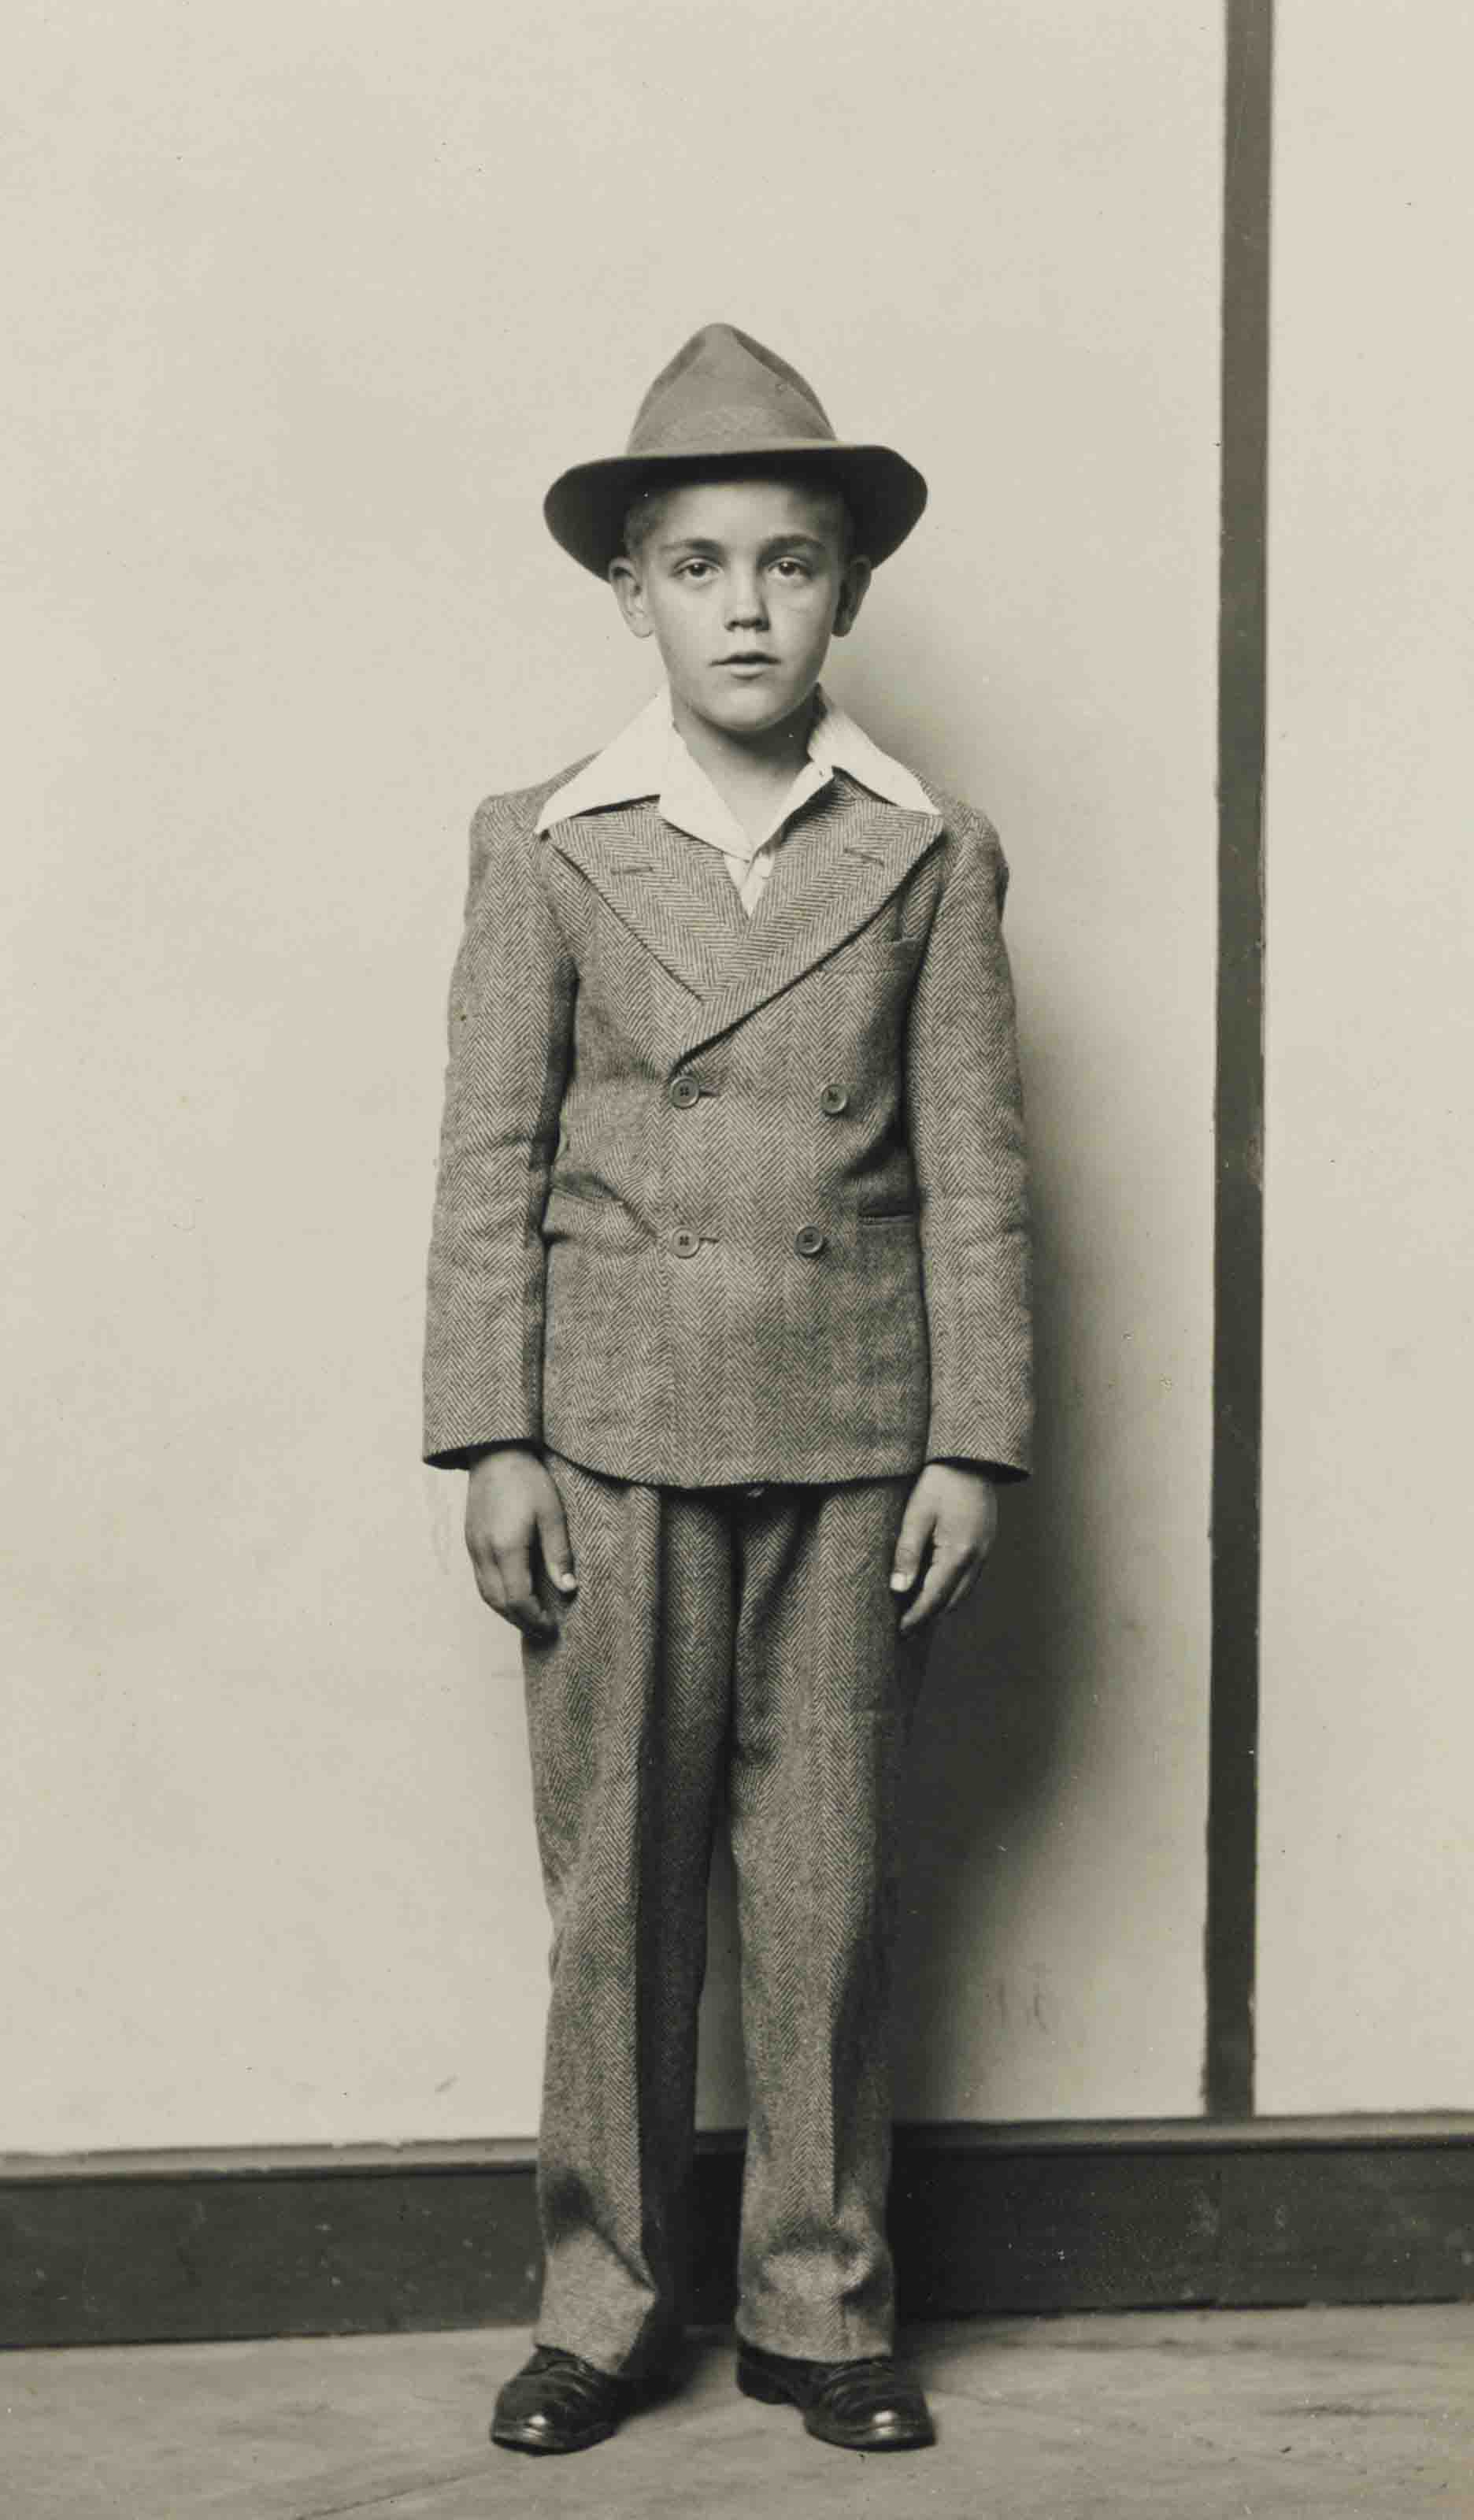 Heber Springs, Arkansas, c. 1940-1945